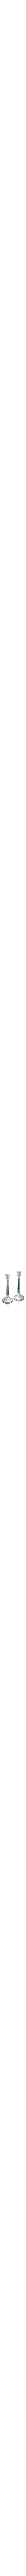 Blue silver sterling candlesticks,